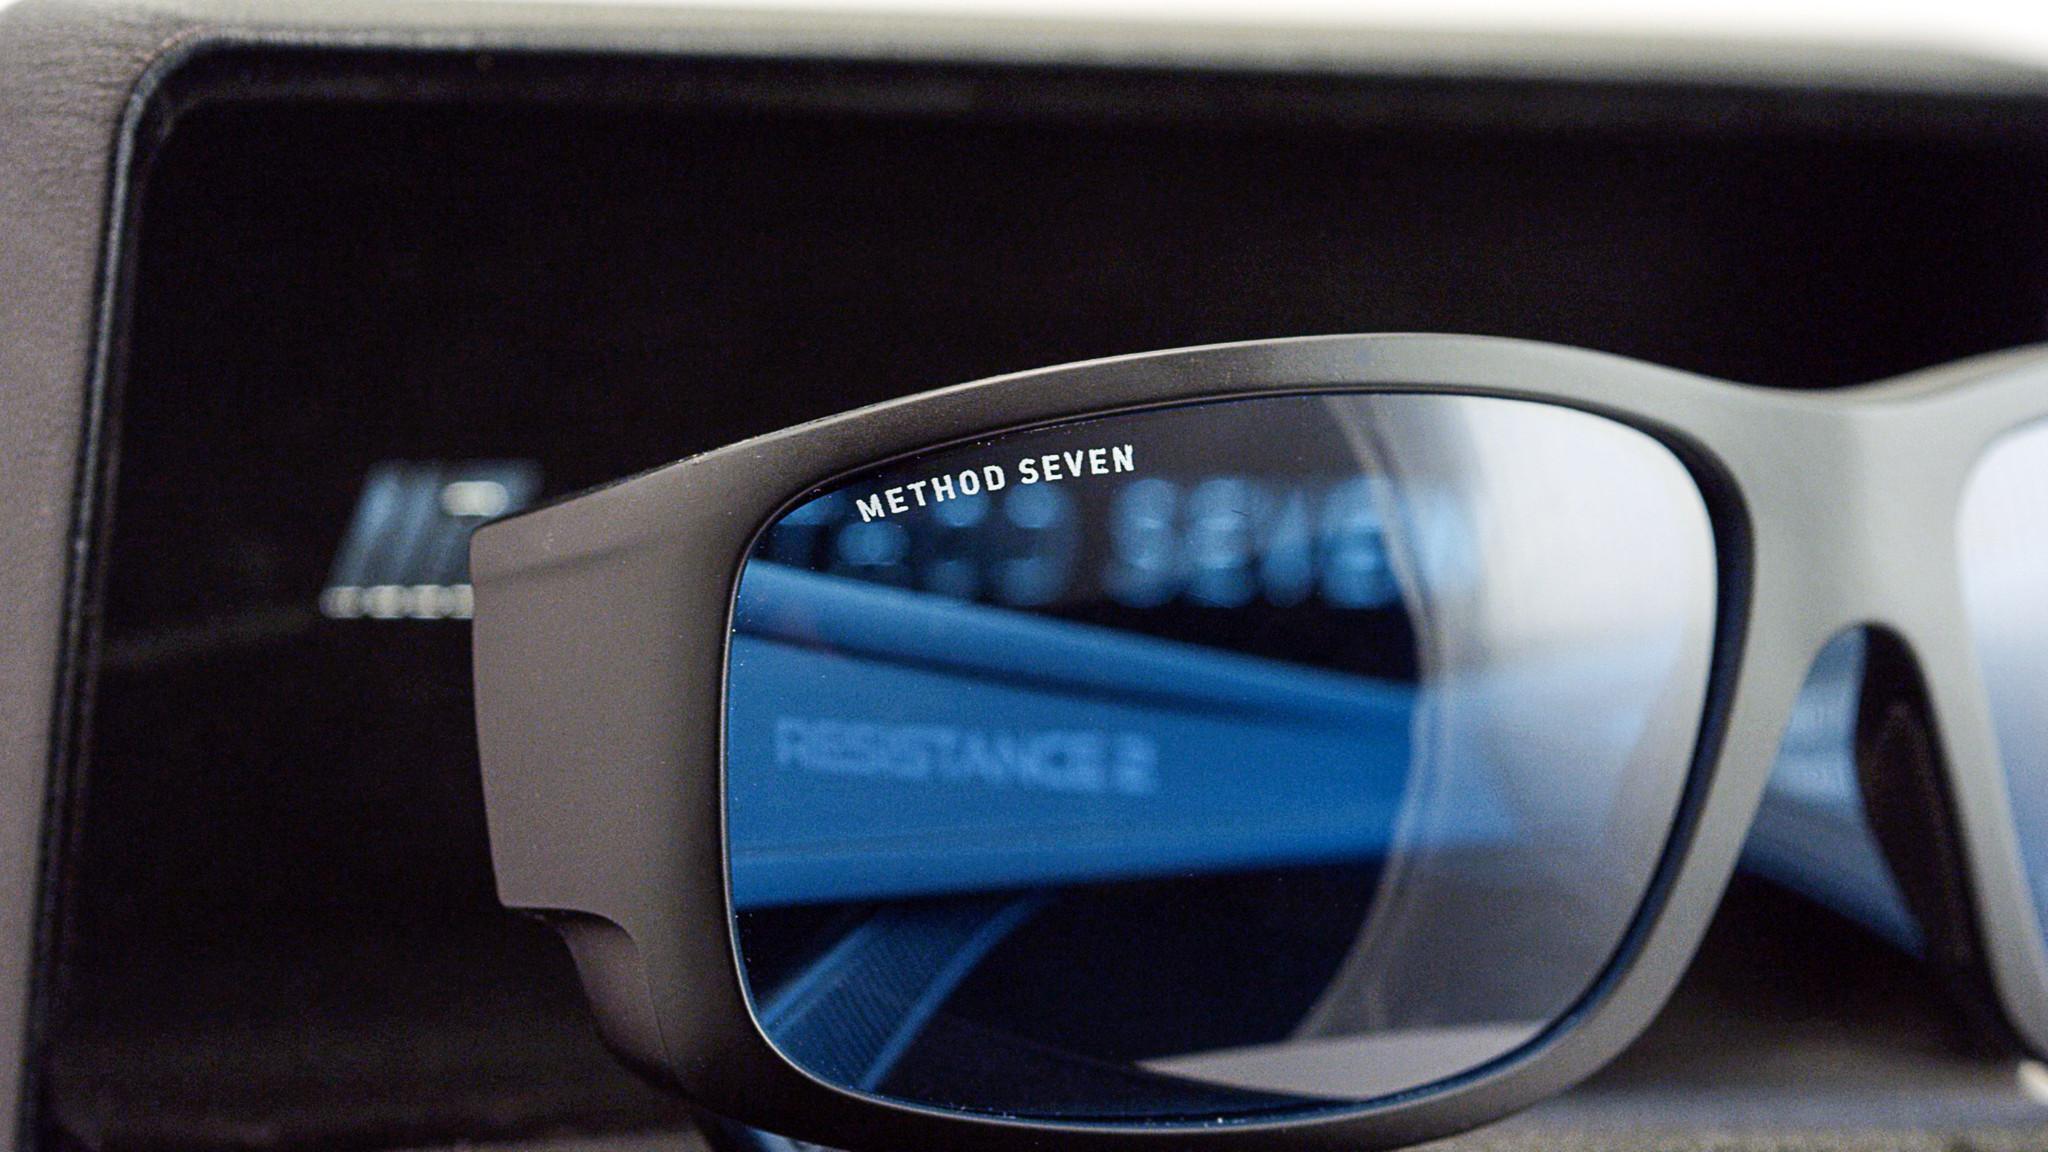 How Do Grow Lights Damage Eyes When LED Glasses Aren't Worn?